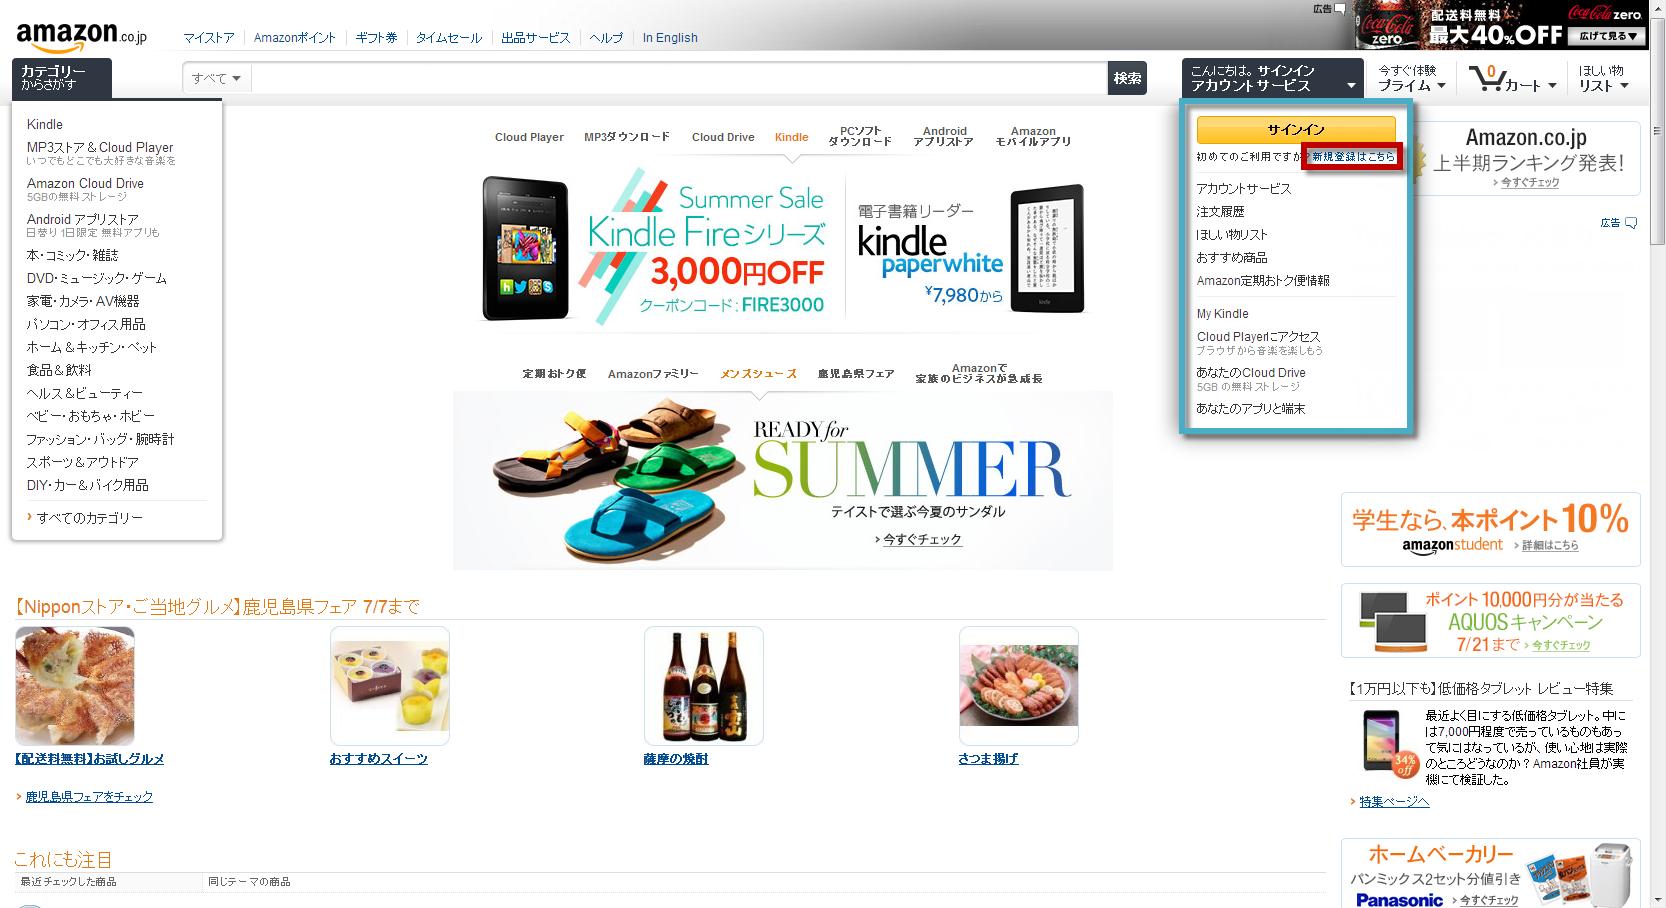 Amazonのアカウント登録する